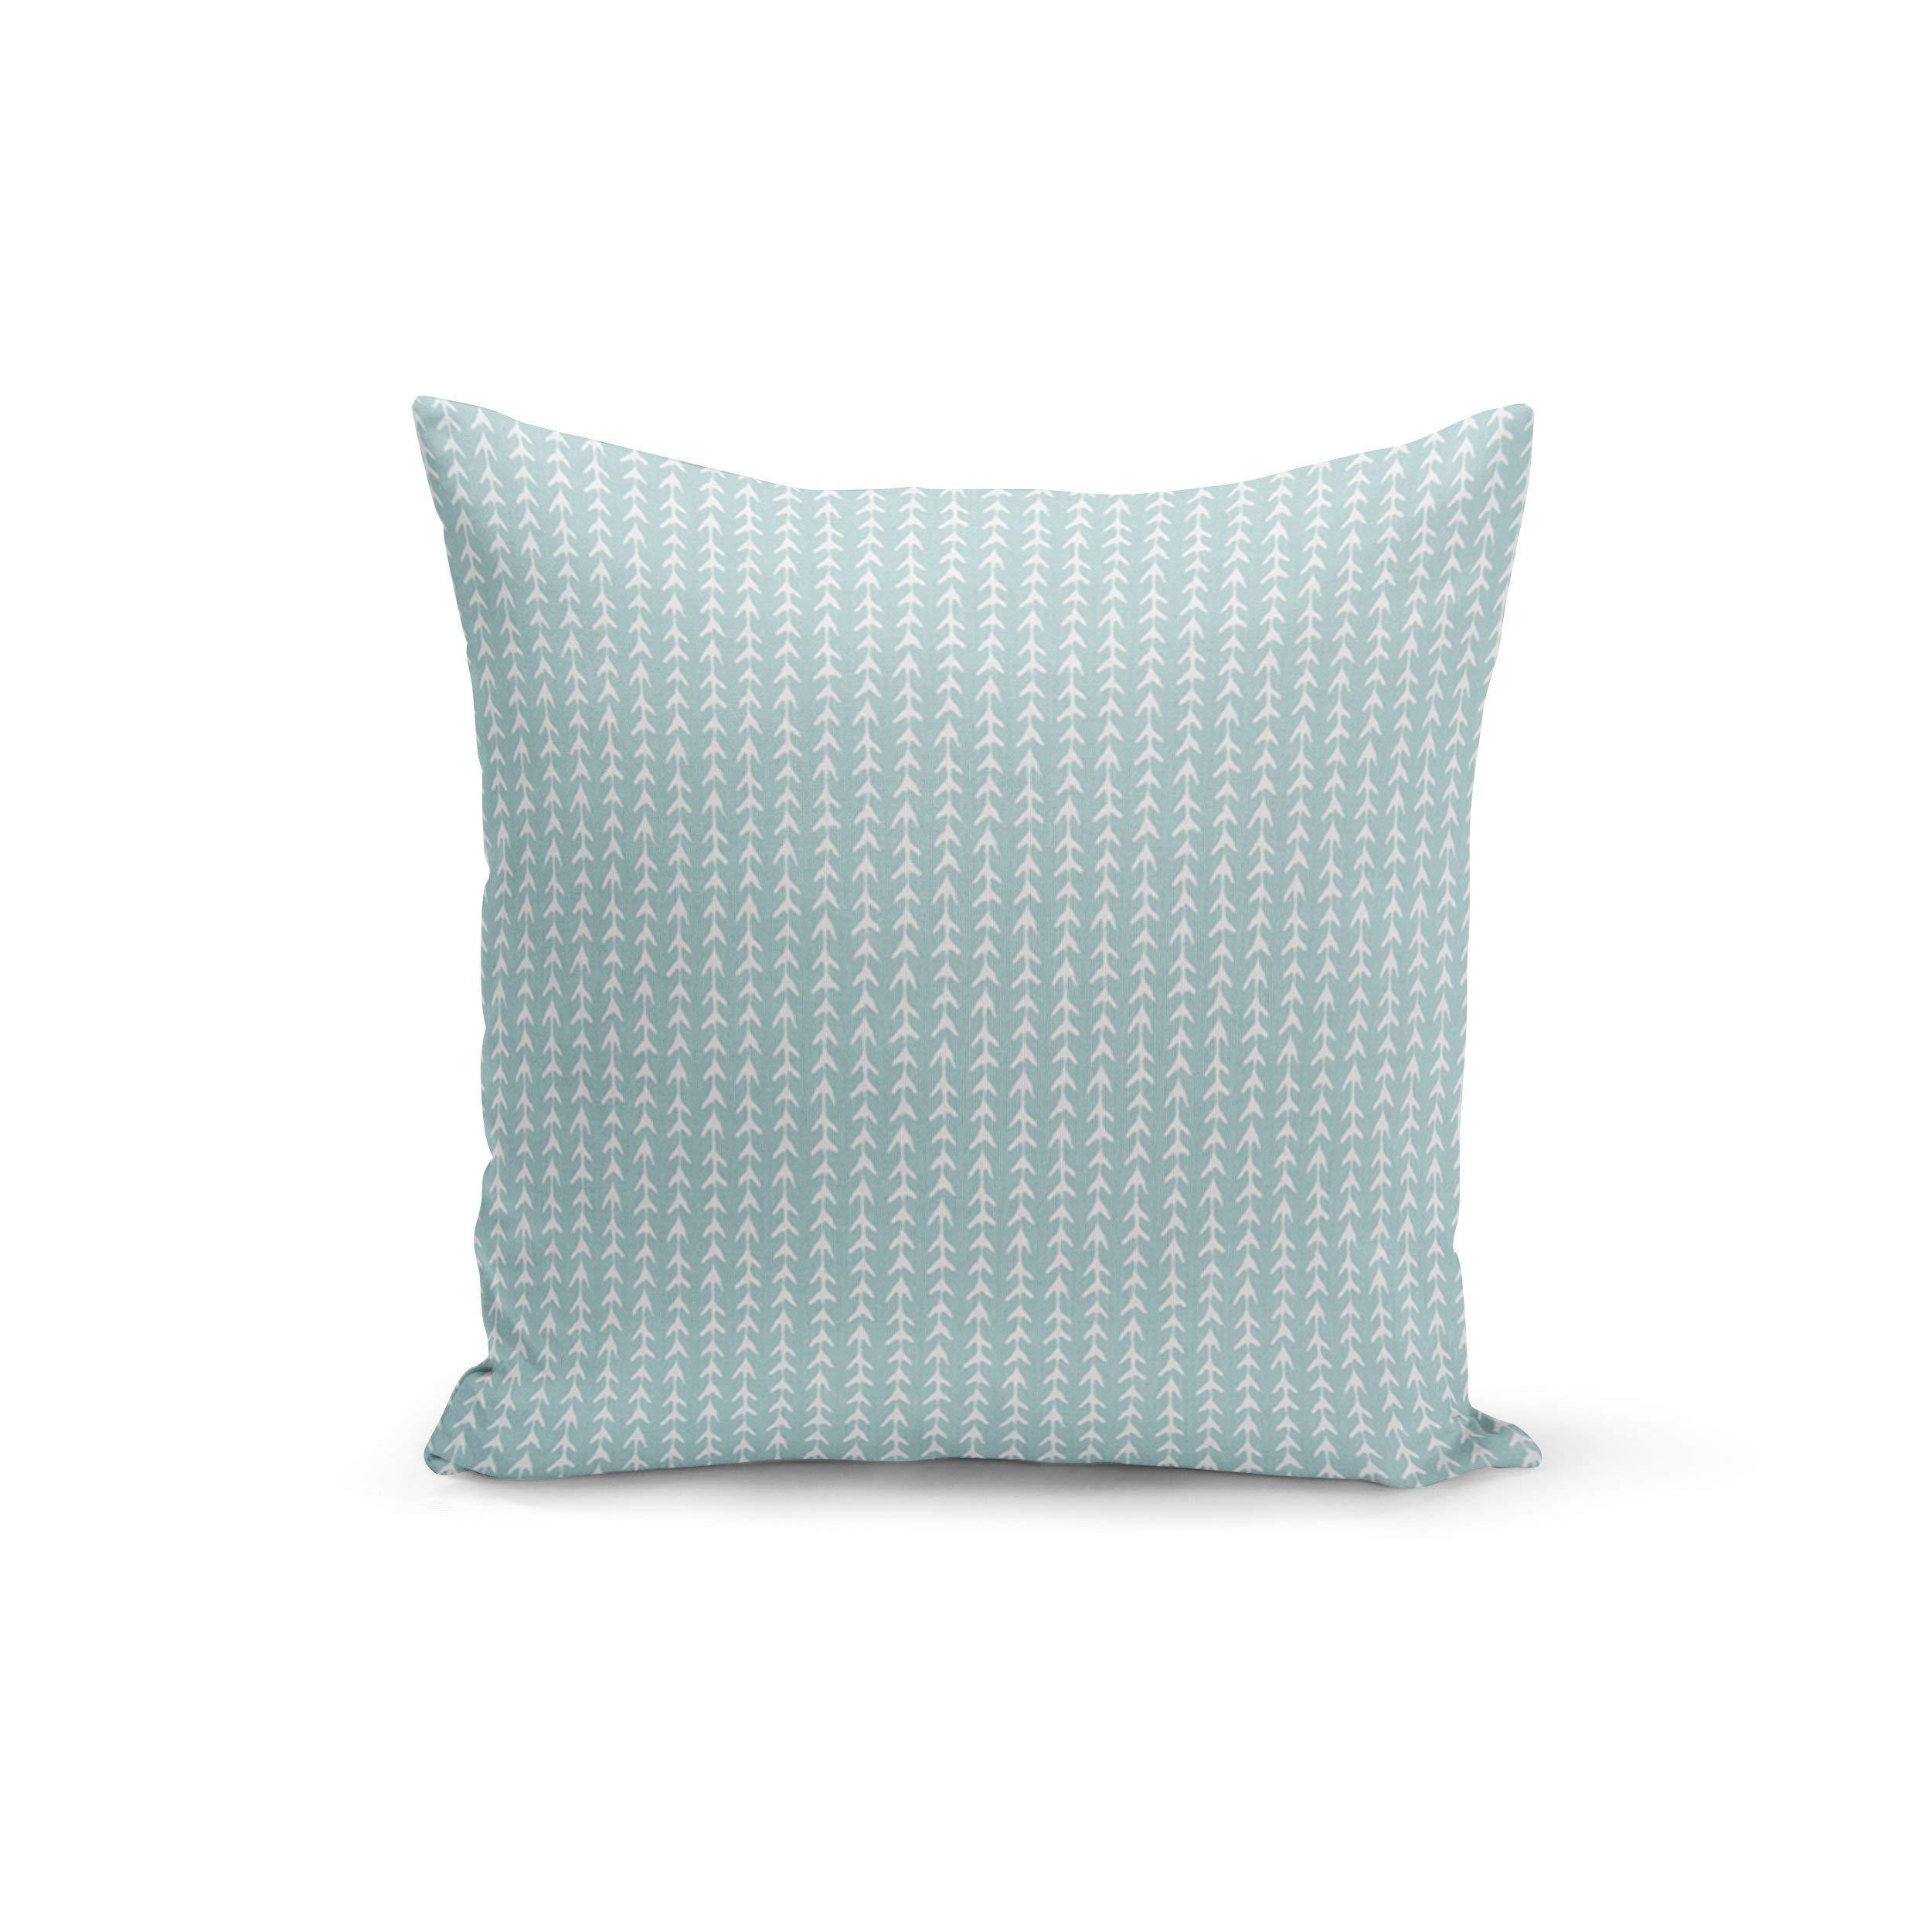 alerie Sassoon Sealife Seaweed Pillowcase Cover Premier Prints Vine Spa Blue Blue Pillowcase Cover Cushion Cover